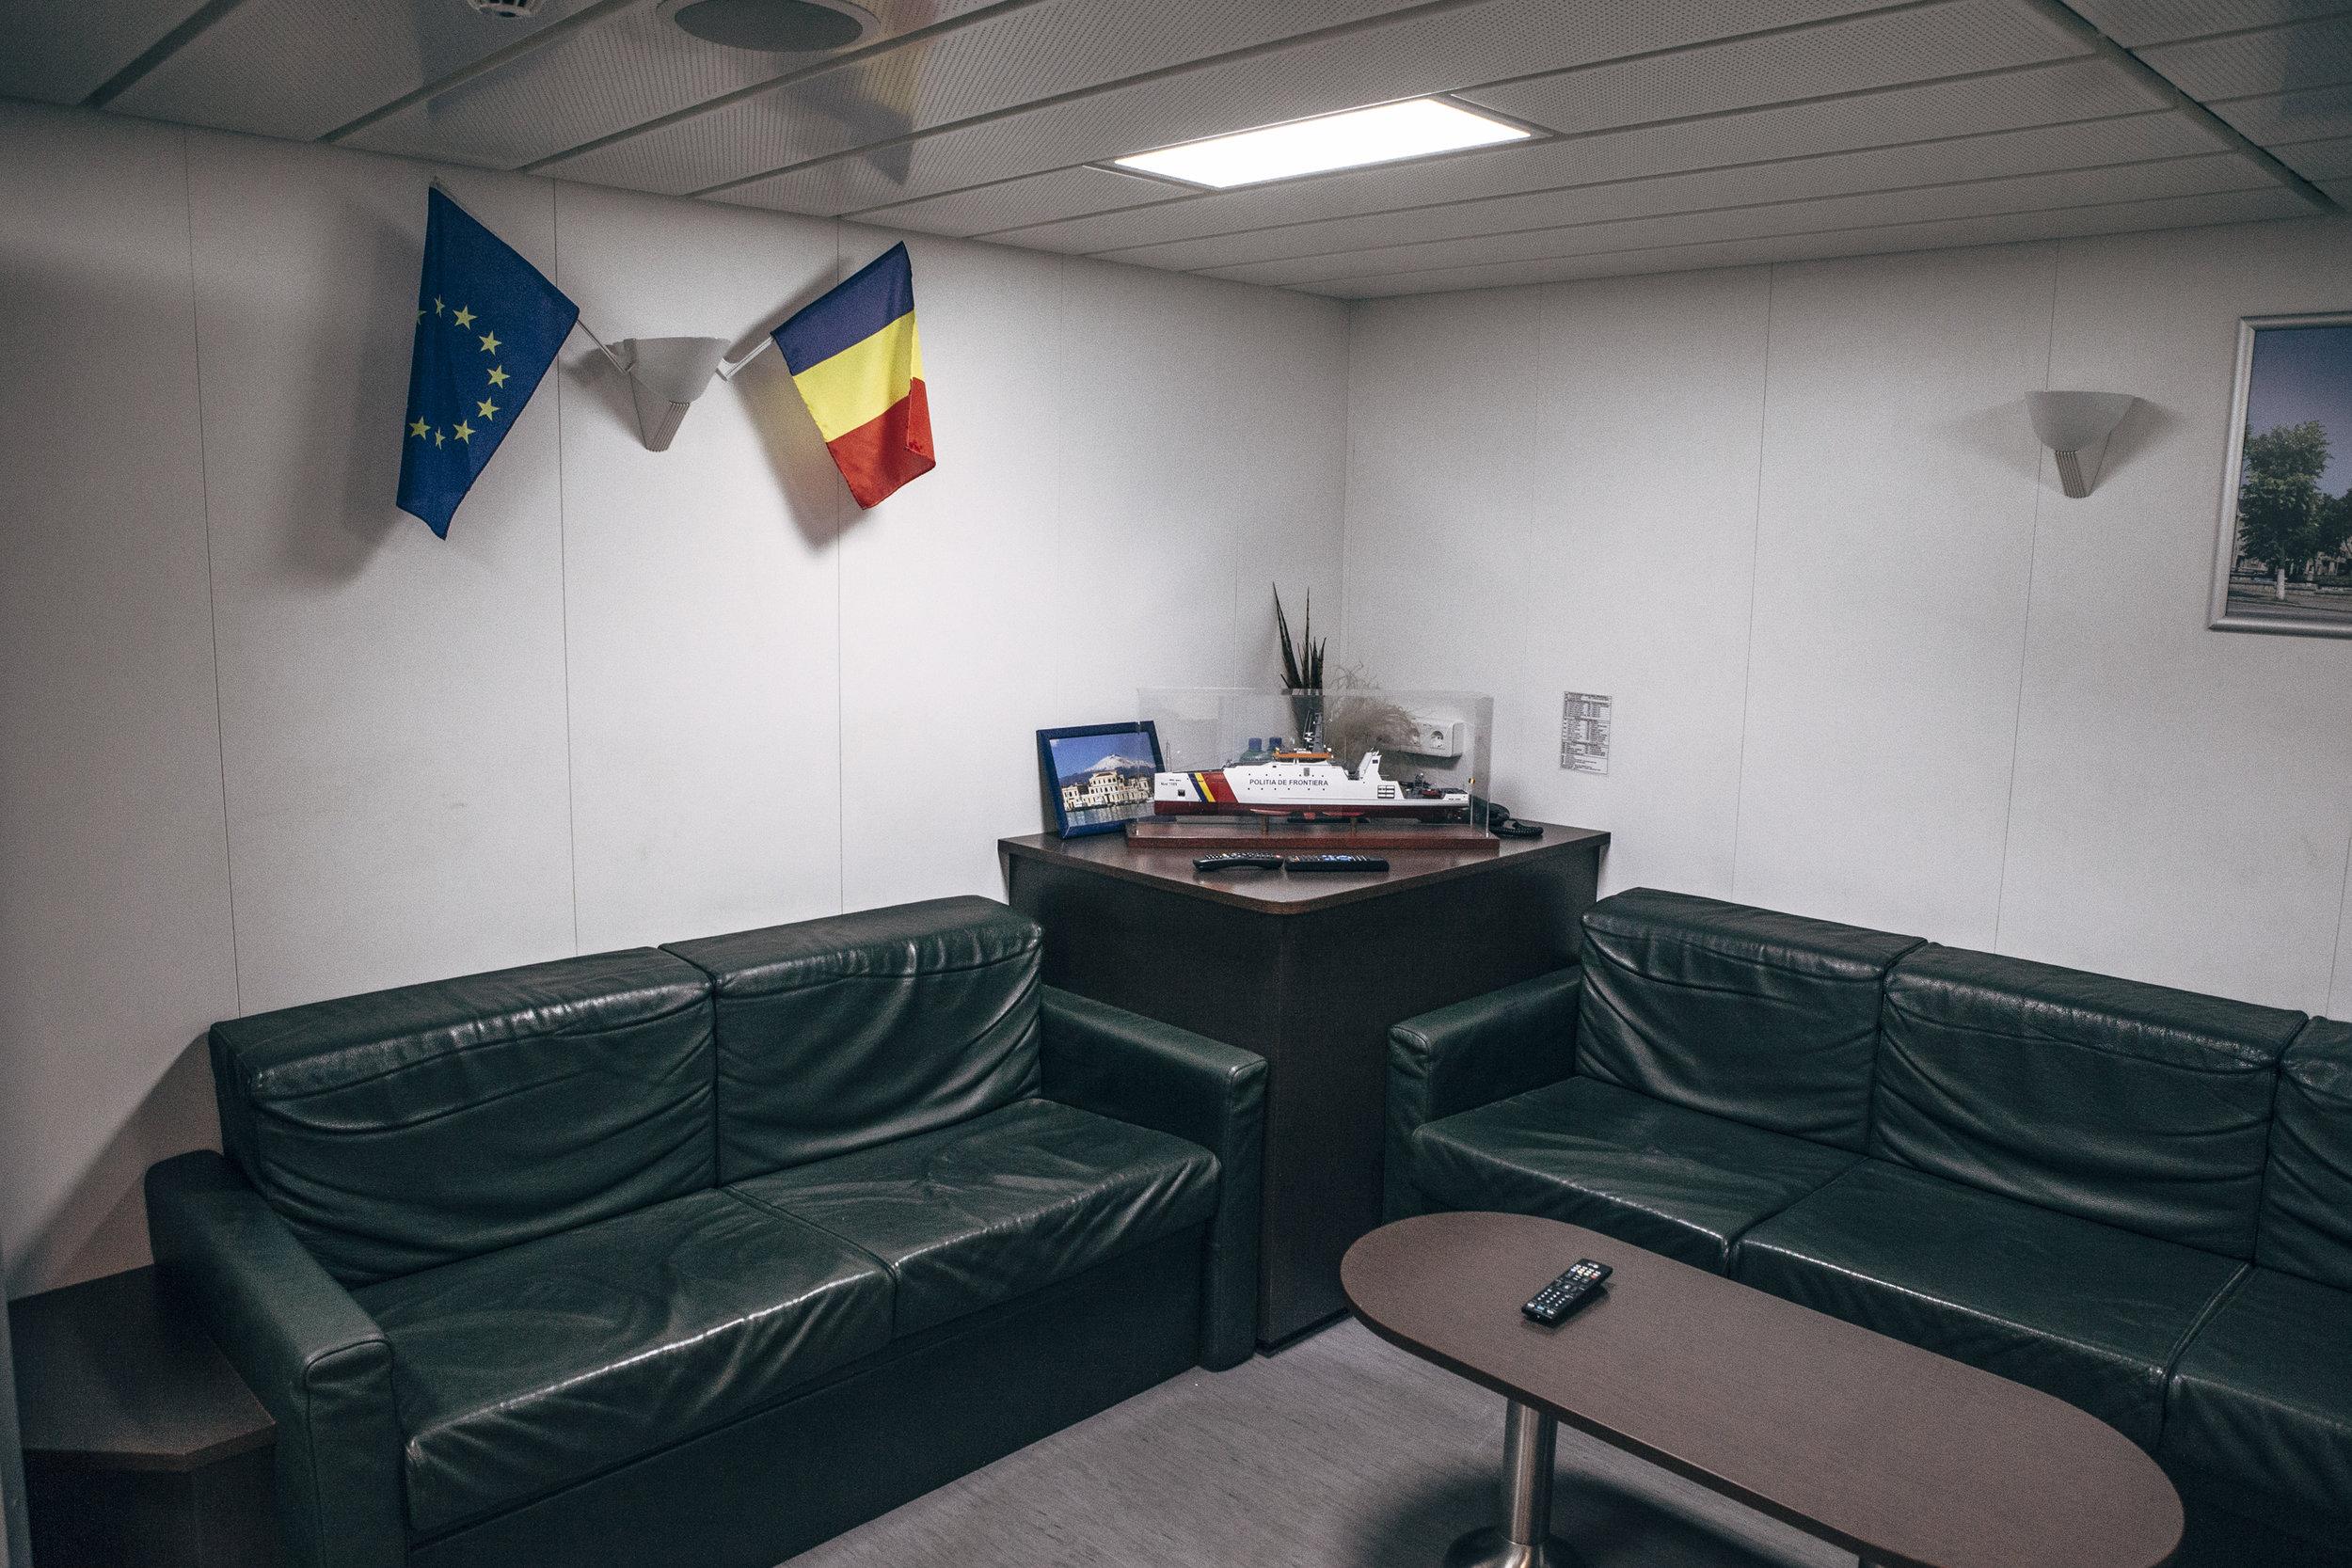 Aufenthaltsraum OPV (Offshore Patrol Vessel) 6610, Constanta